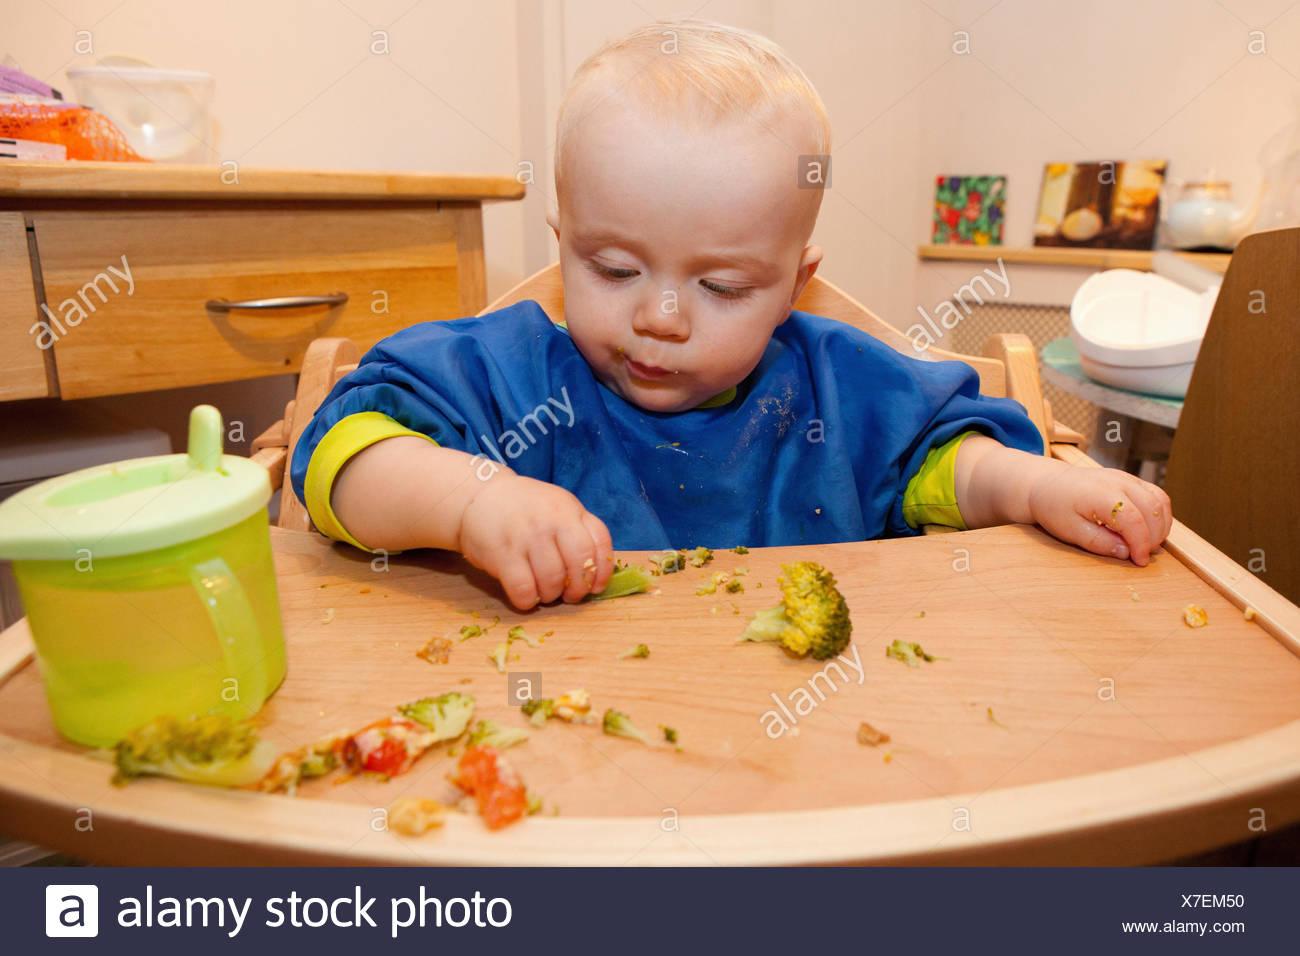 Baby feeding himself - Stock Image